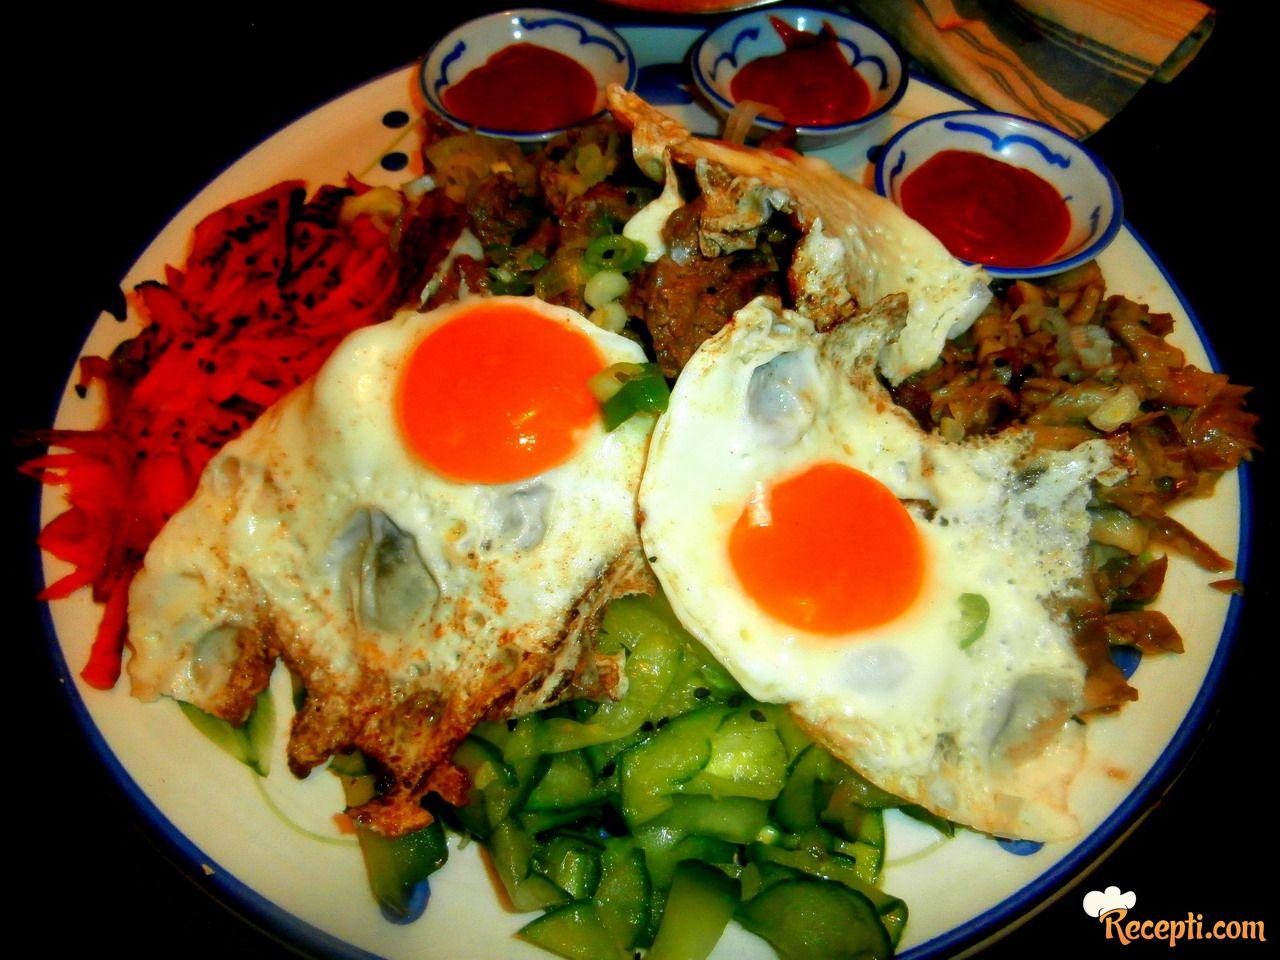 Bibimbap - Koreanski mešani pirinač